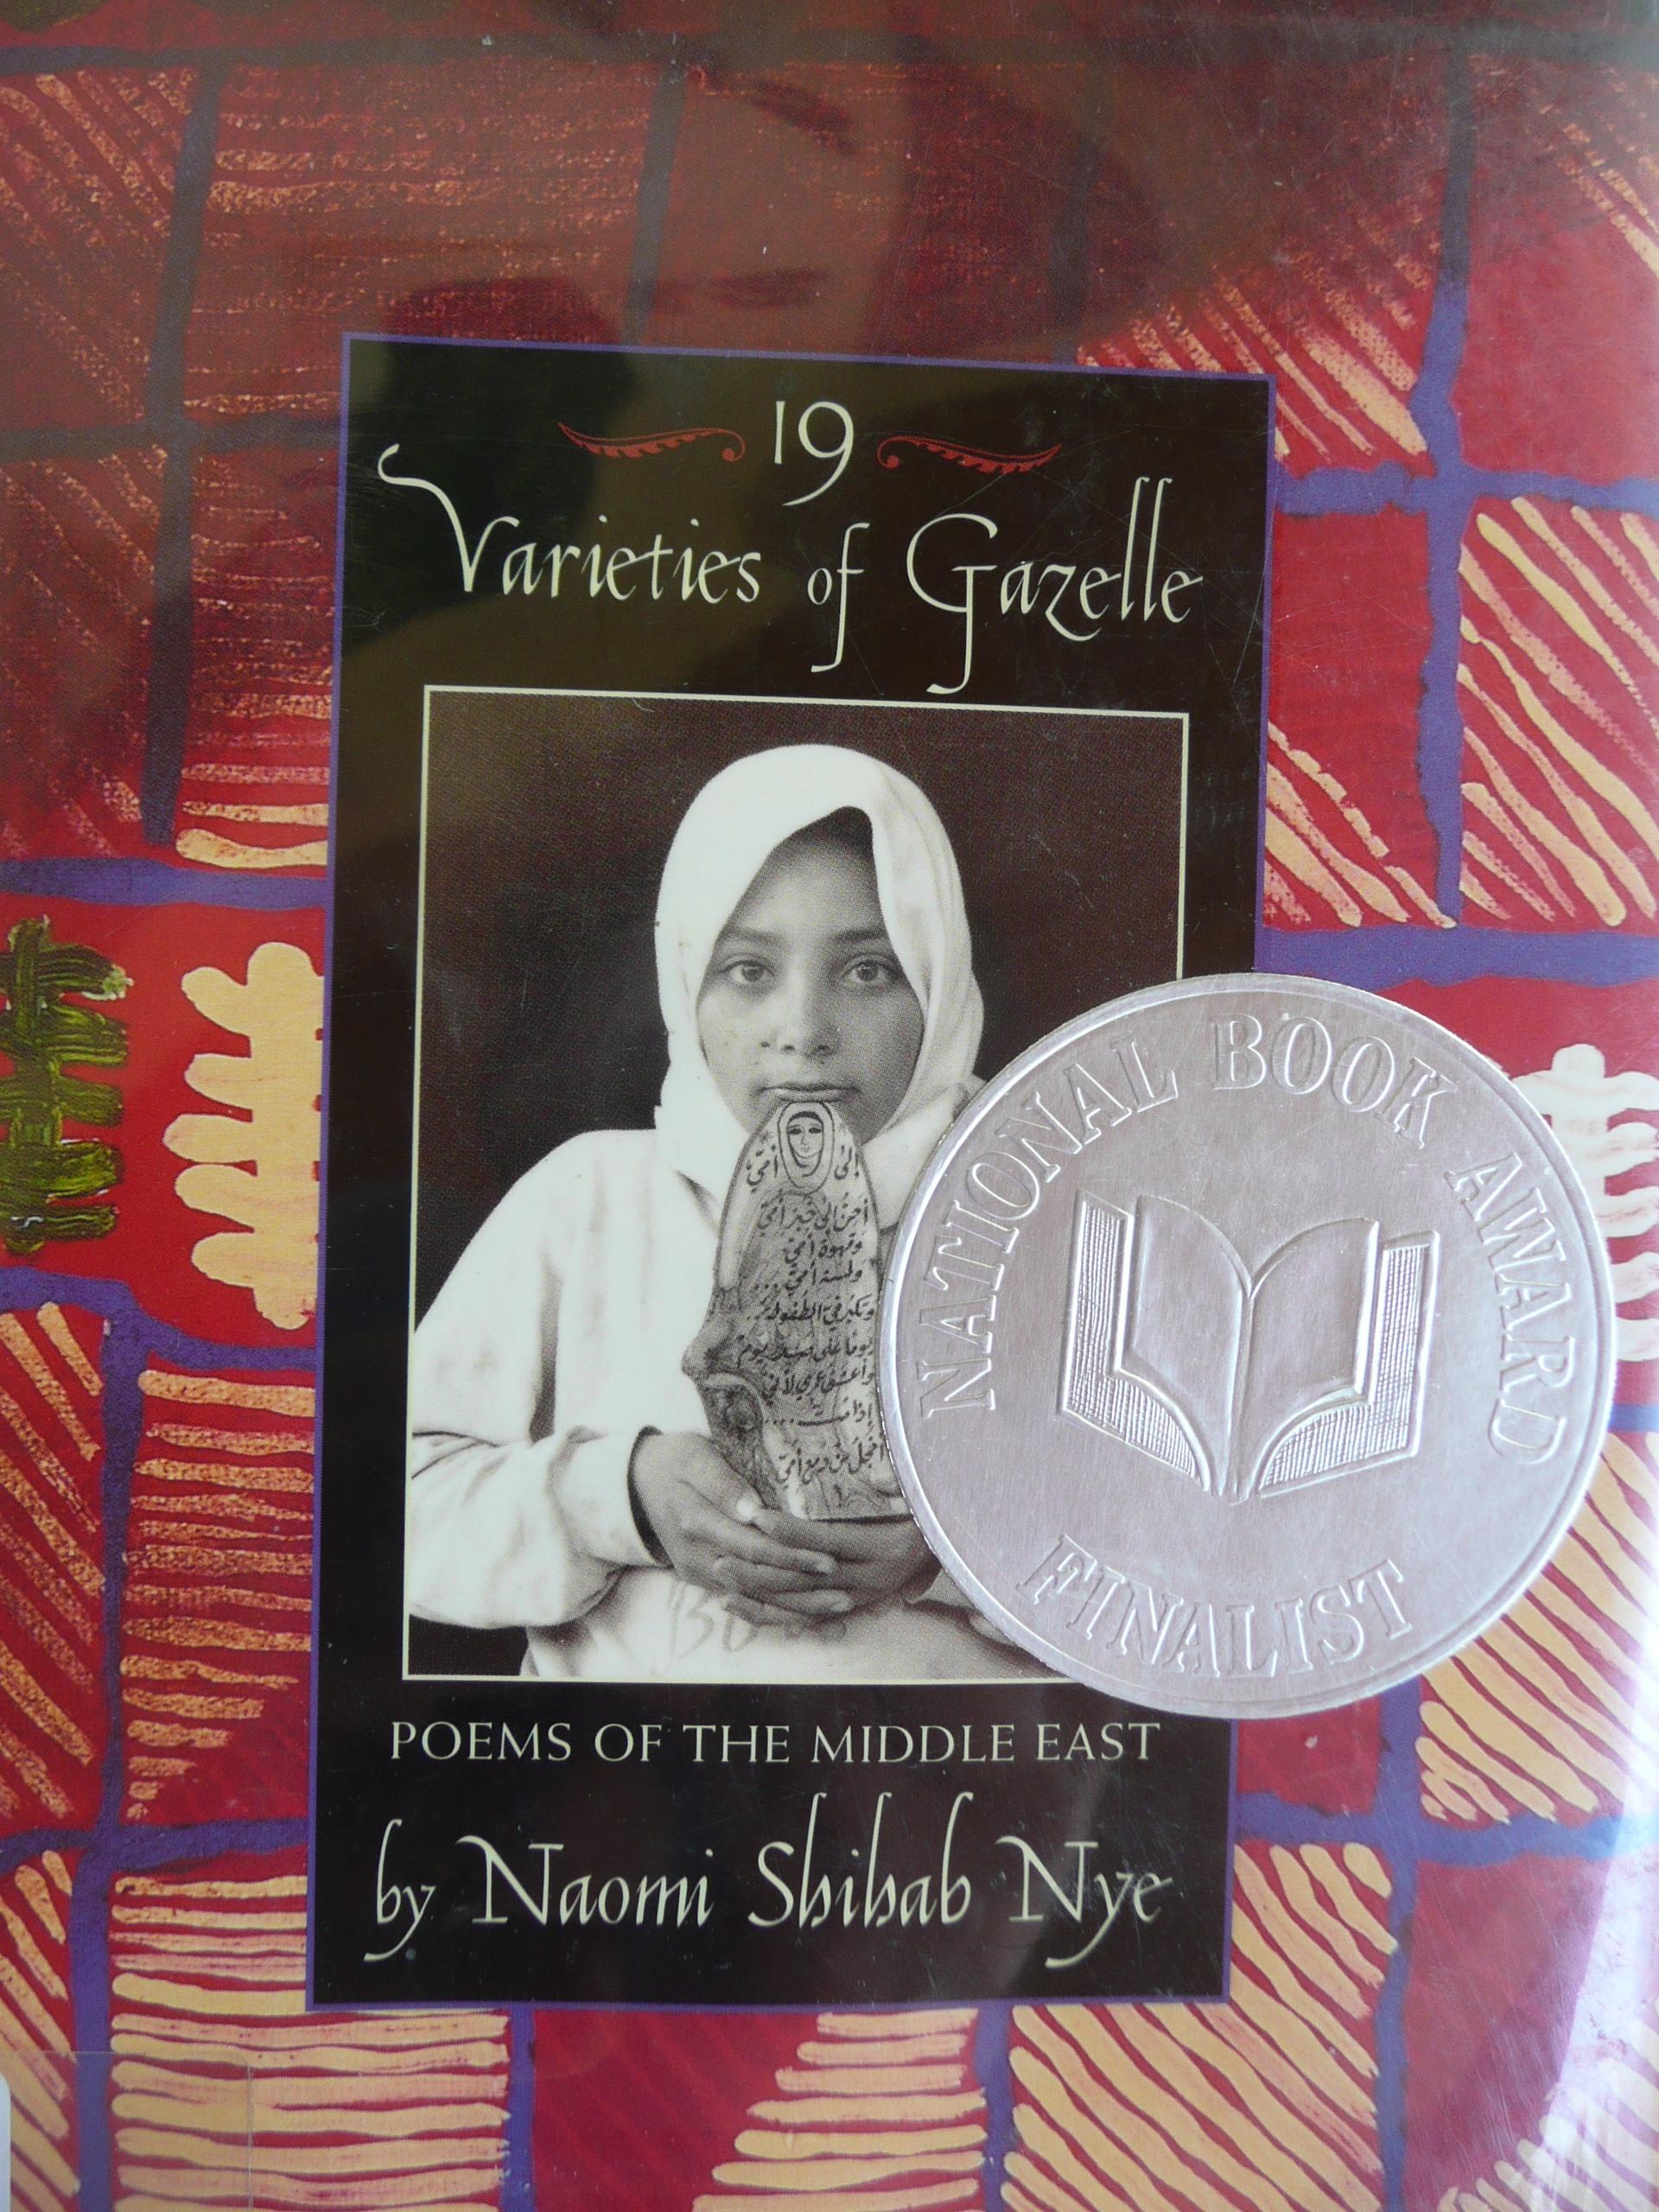 an analysis of habibi by naomi shihab nye Abibliographic data: nye, naomi shihab 1999 habibi simon & shuster children's publishing division: new york, new york isbn 0-689-80149-1(hc.